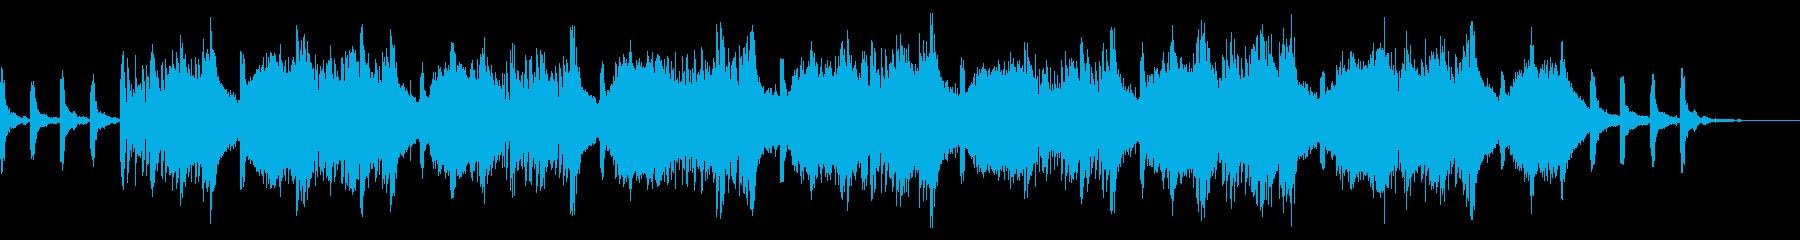 Superluminalの再生済みの波形